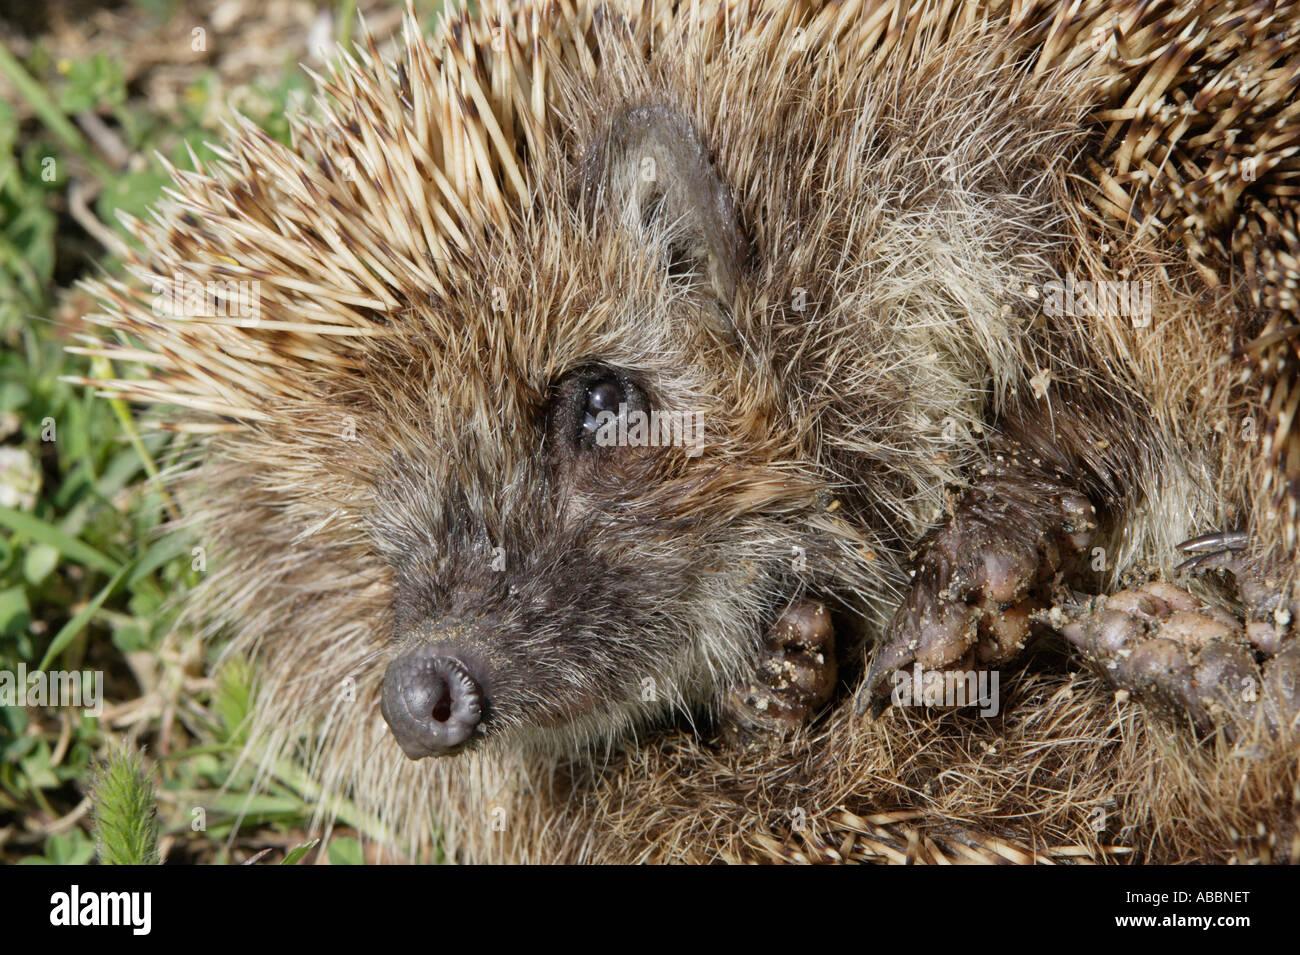 Eastern Hedgehog - Stock Image